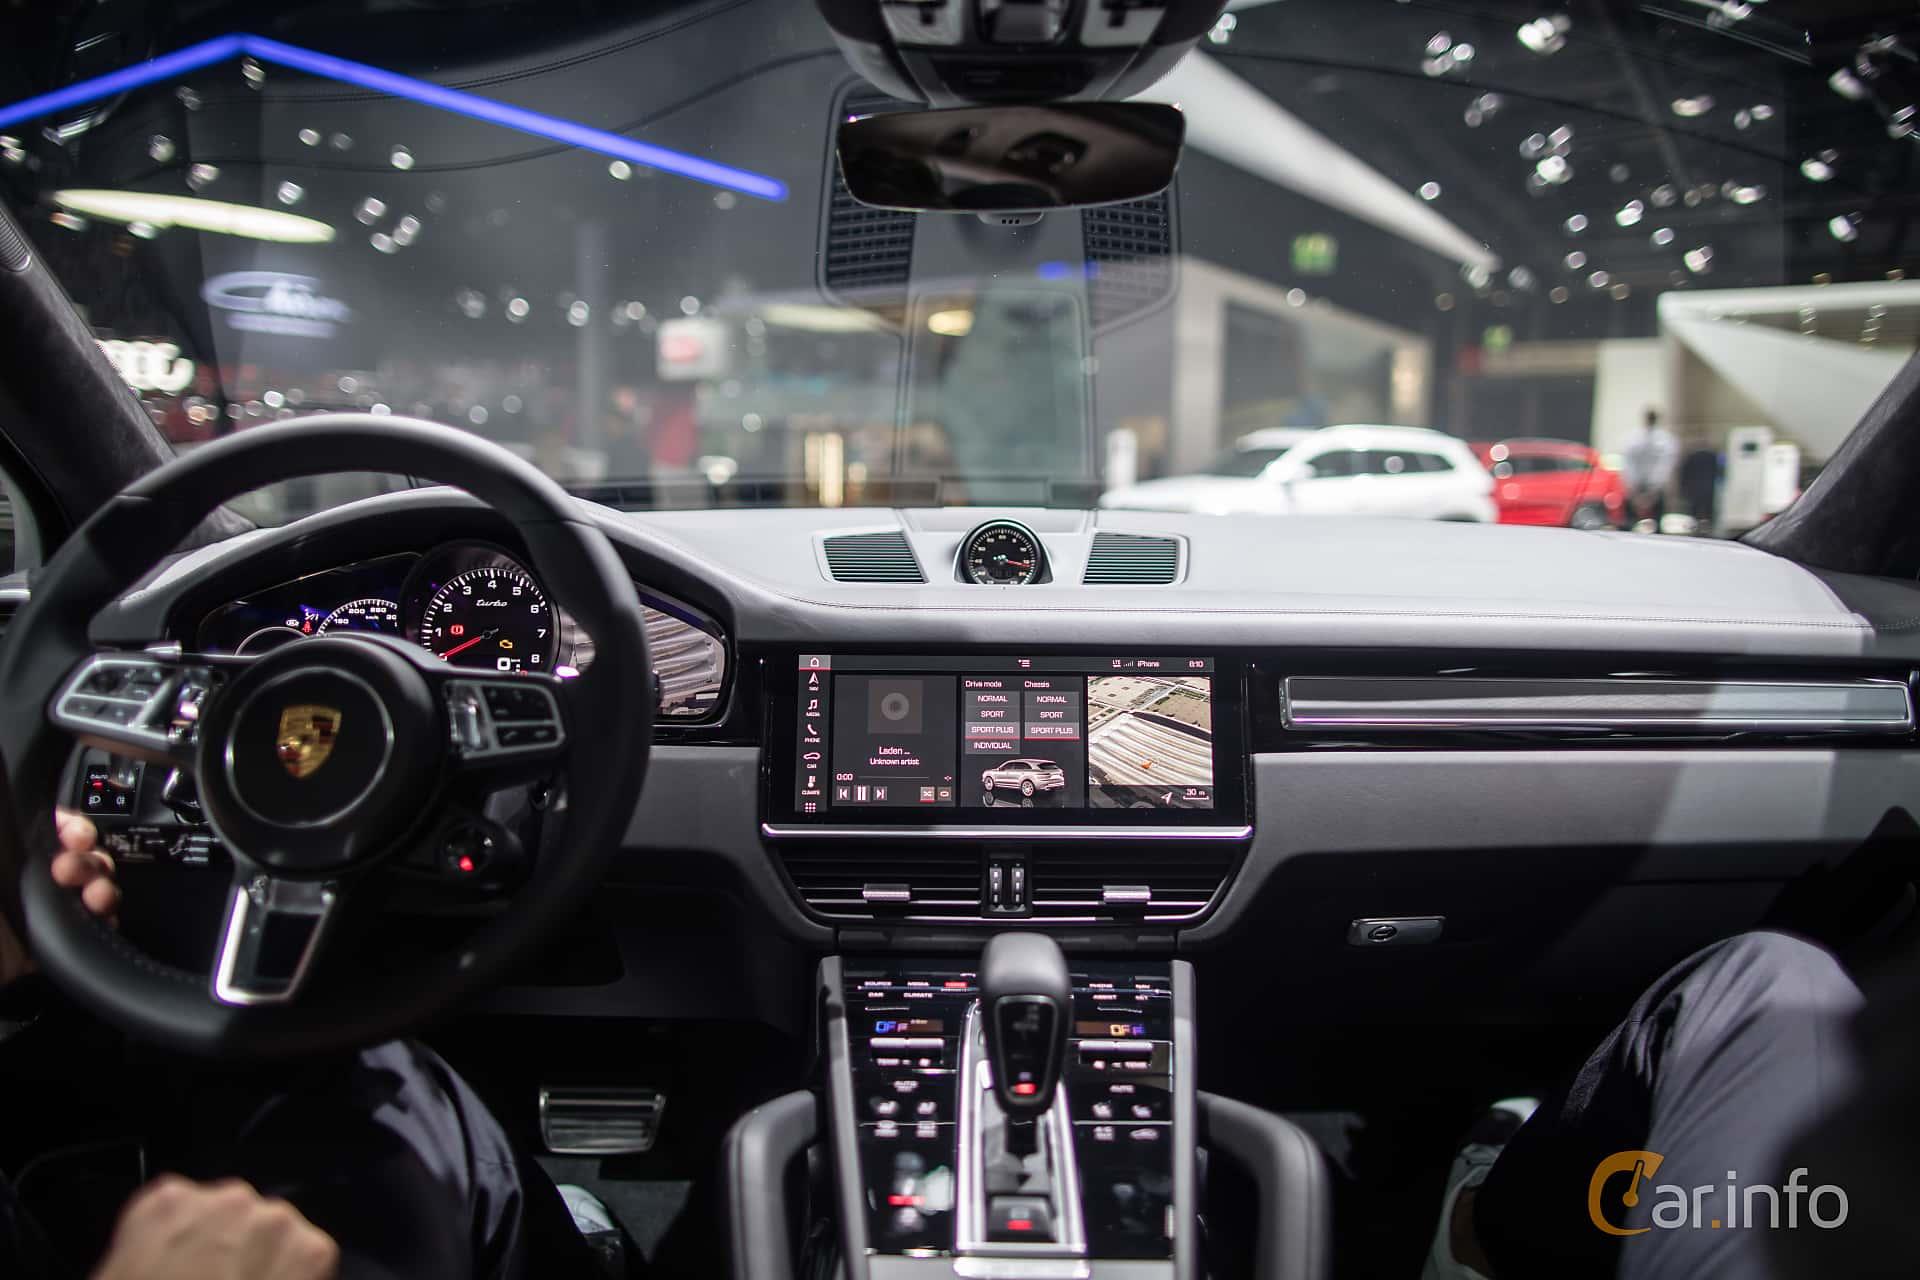 2018 porsche cayenne interior.  2018 interior of porsche cayenne turbo 40 v8 4 tiptronic s 550ps 2018 at iaa and porsche cayenne interior